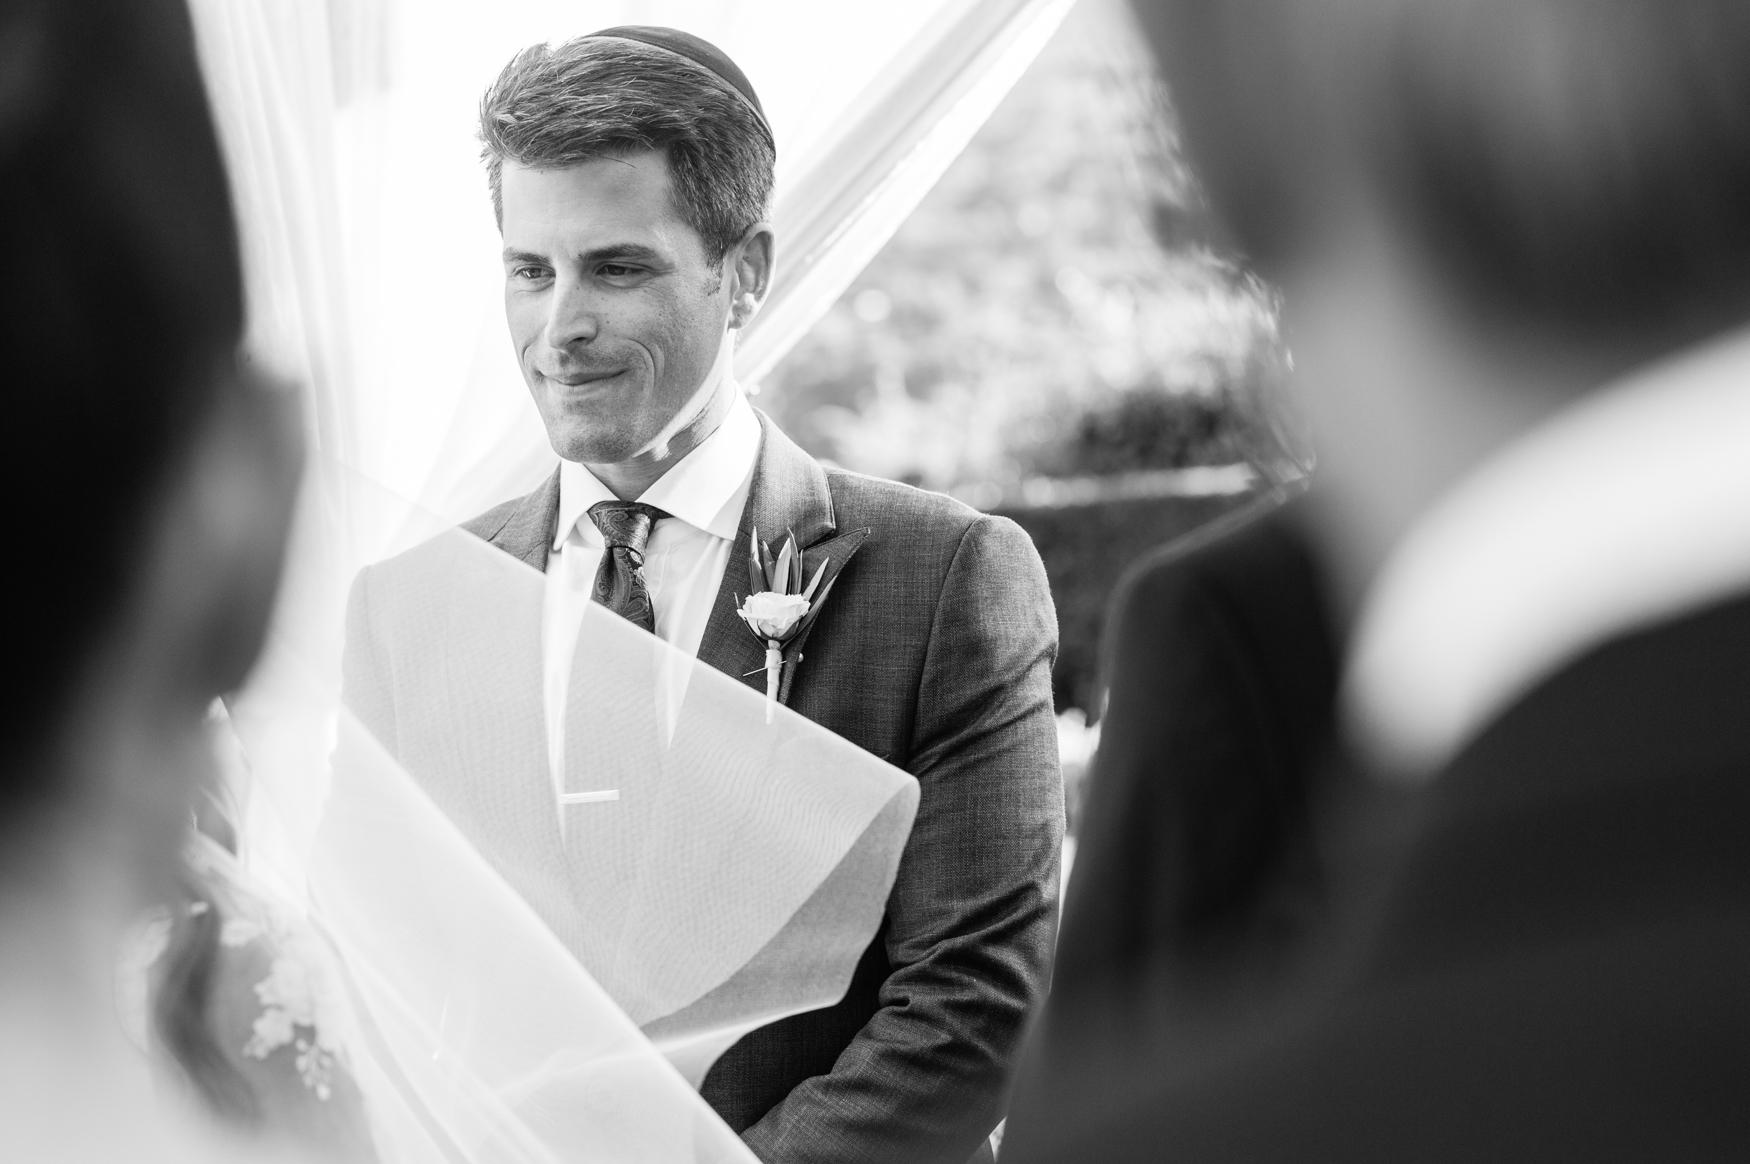 Leon_&_Martine's_Wedding_Photographs_17th_April_2019_@johnhenryweddingphoto_Low_Resolution_Web-269.JPG